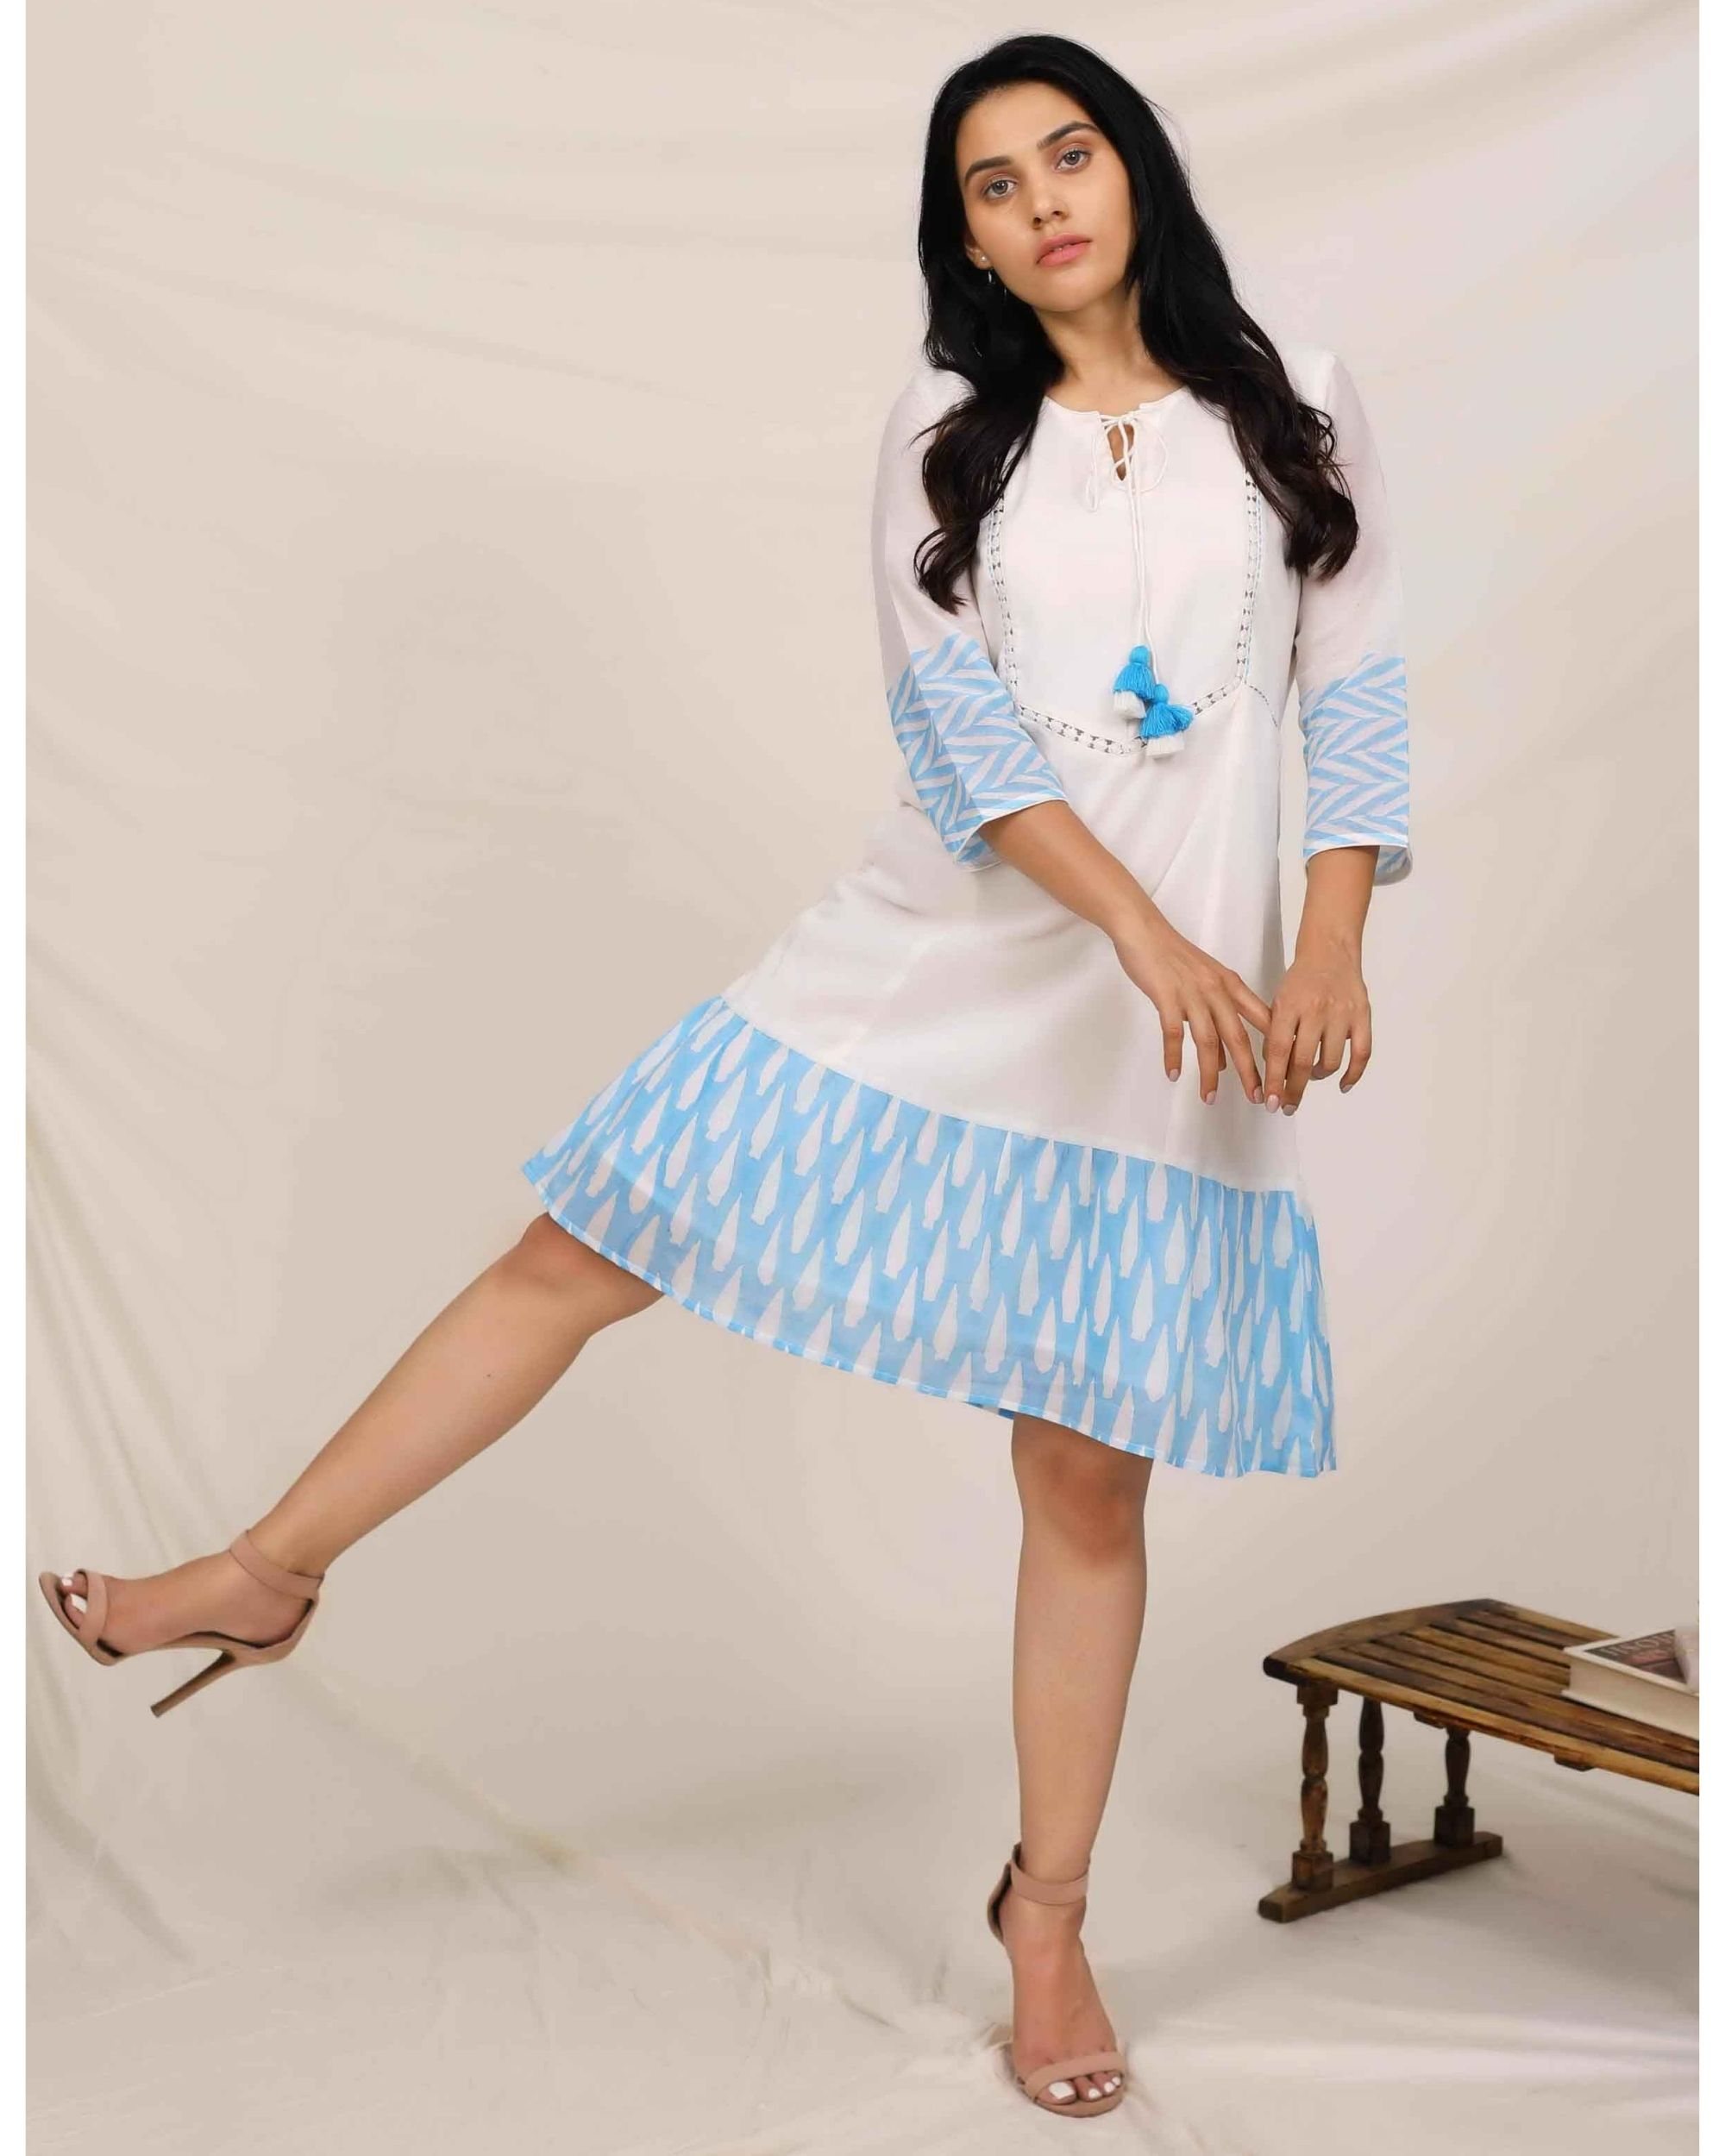 Aqua blue and white geometric hand printed dress